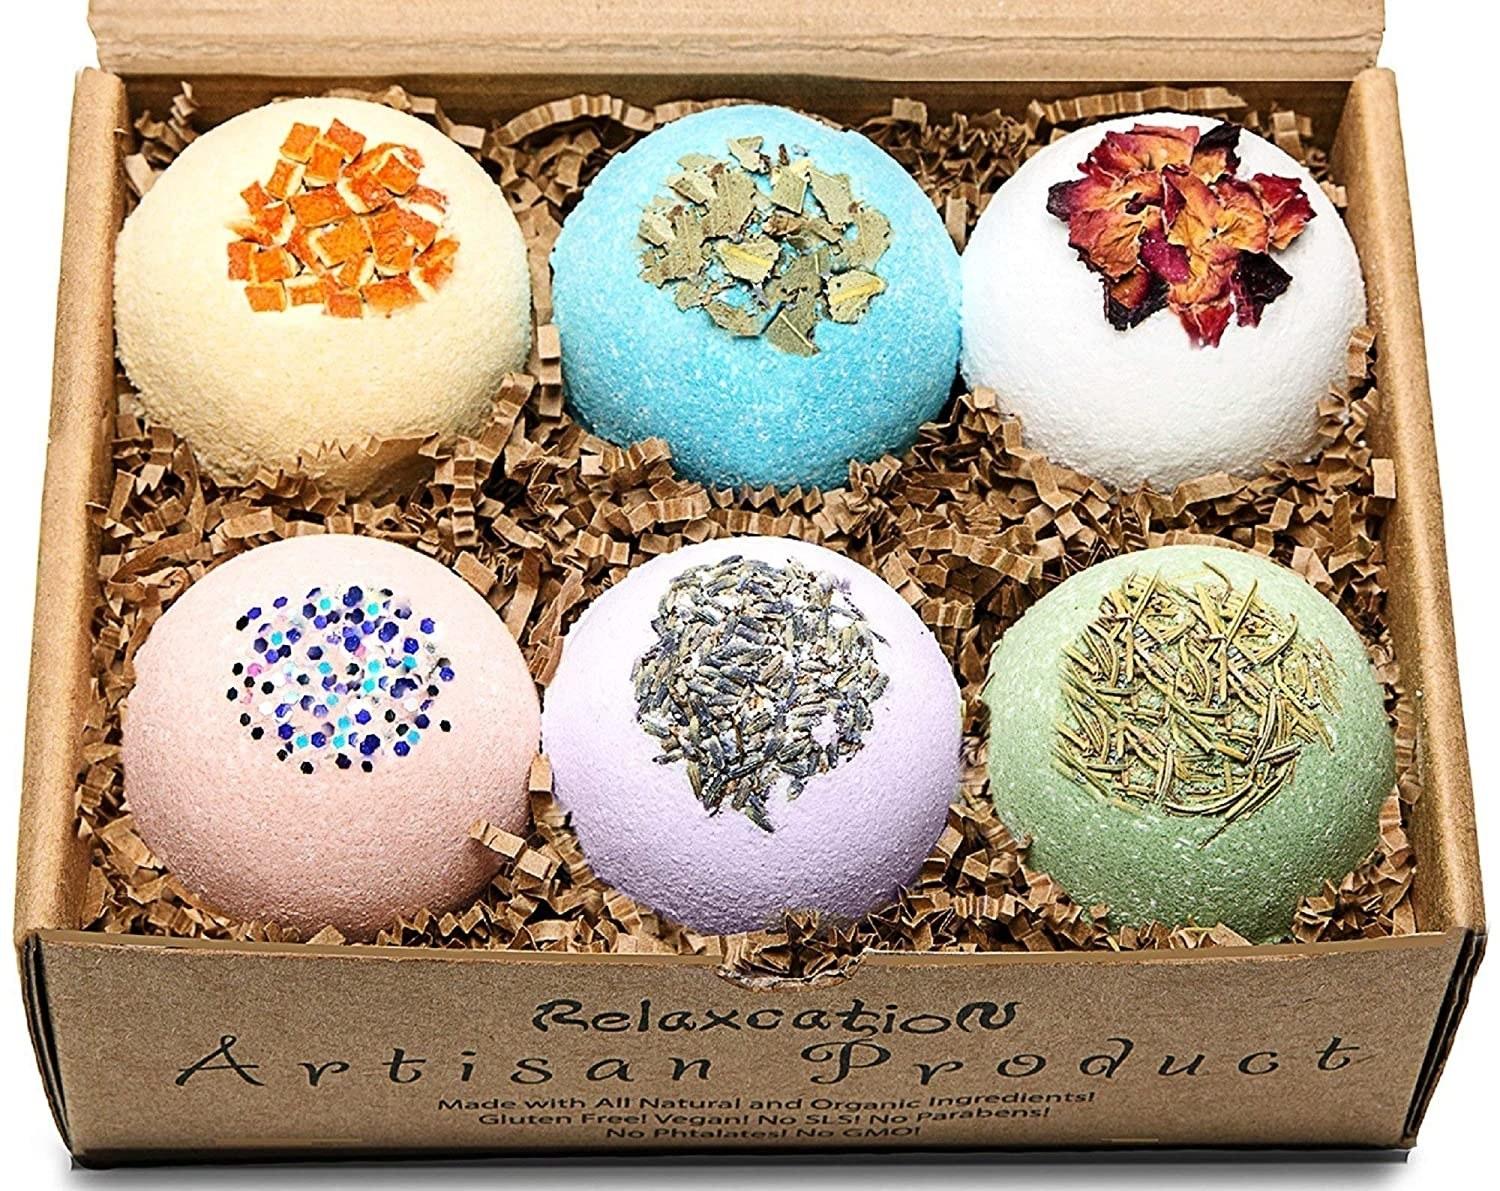 the box of pretty bath bombs